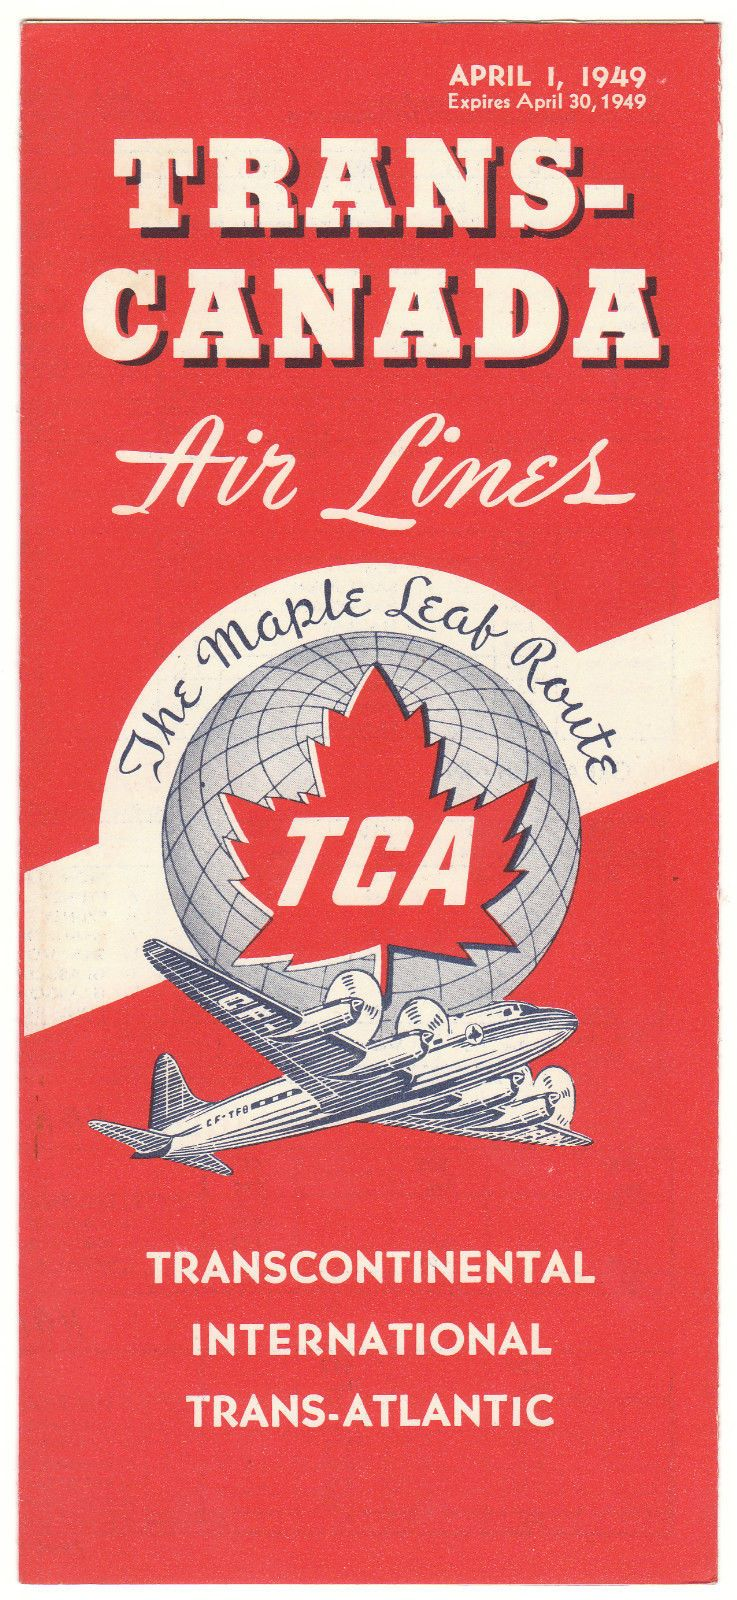 Trans-Canada Airlines (TCA) timetable - April 1, 1949 ...